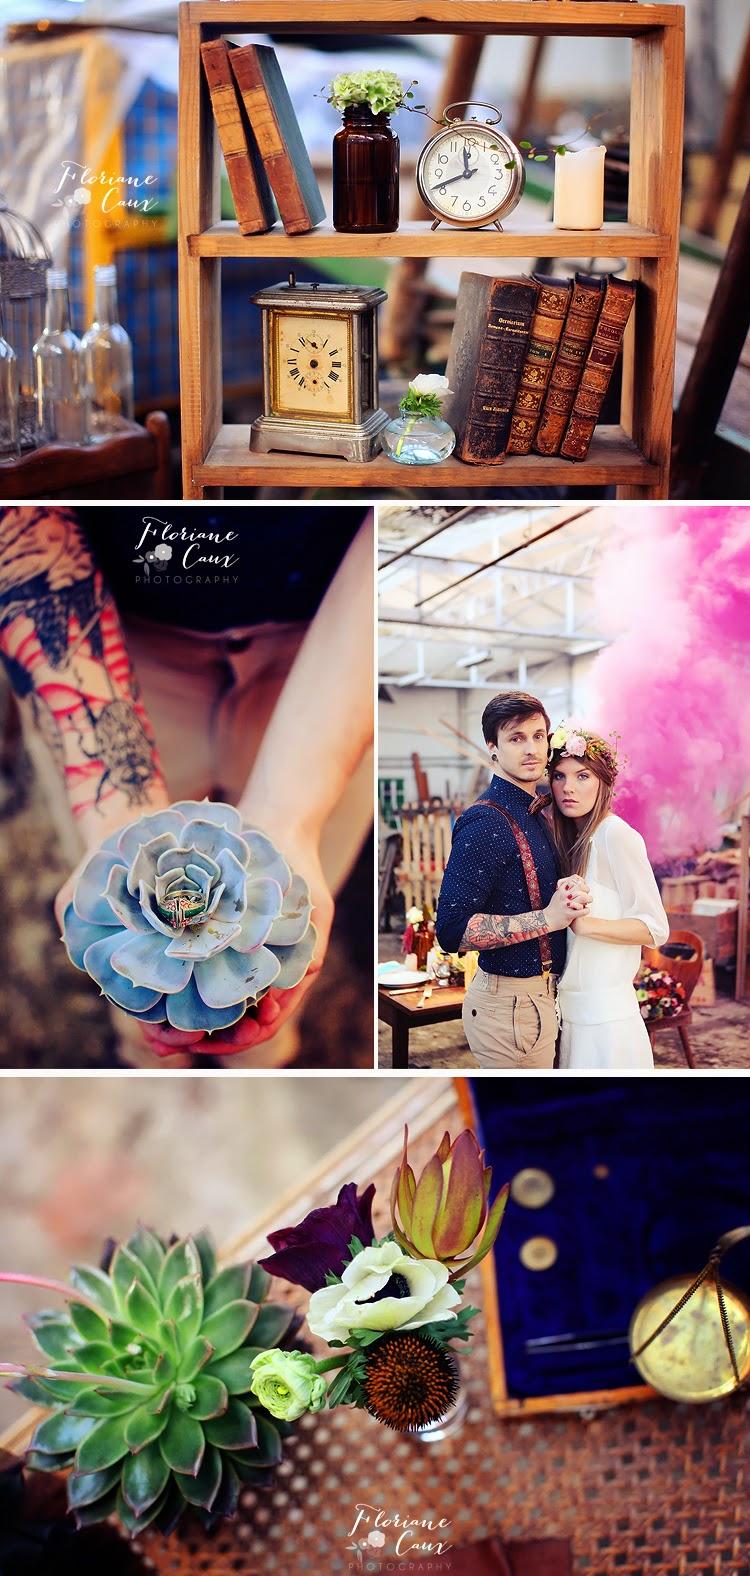 Deco-mariage-steampunk - F.CAUX (18)